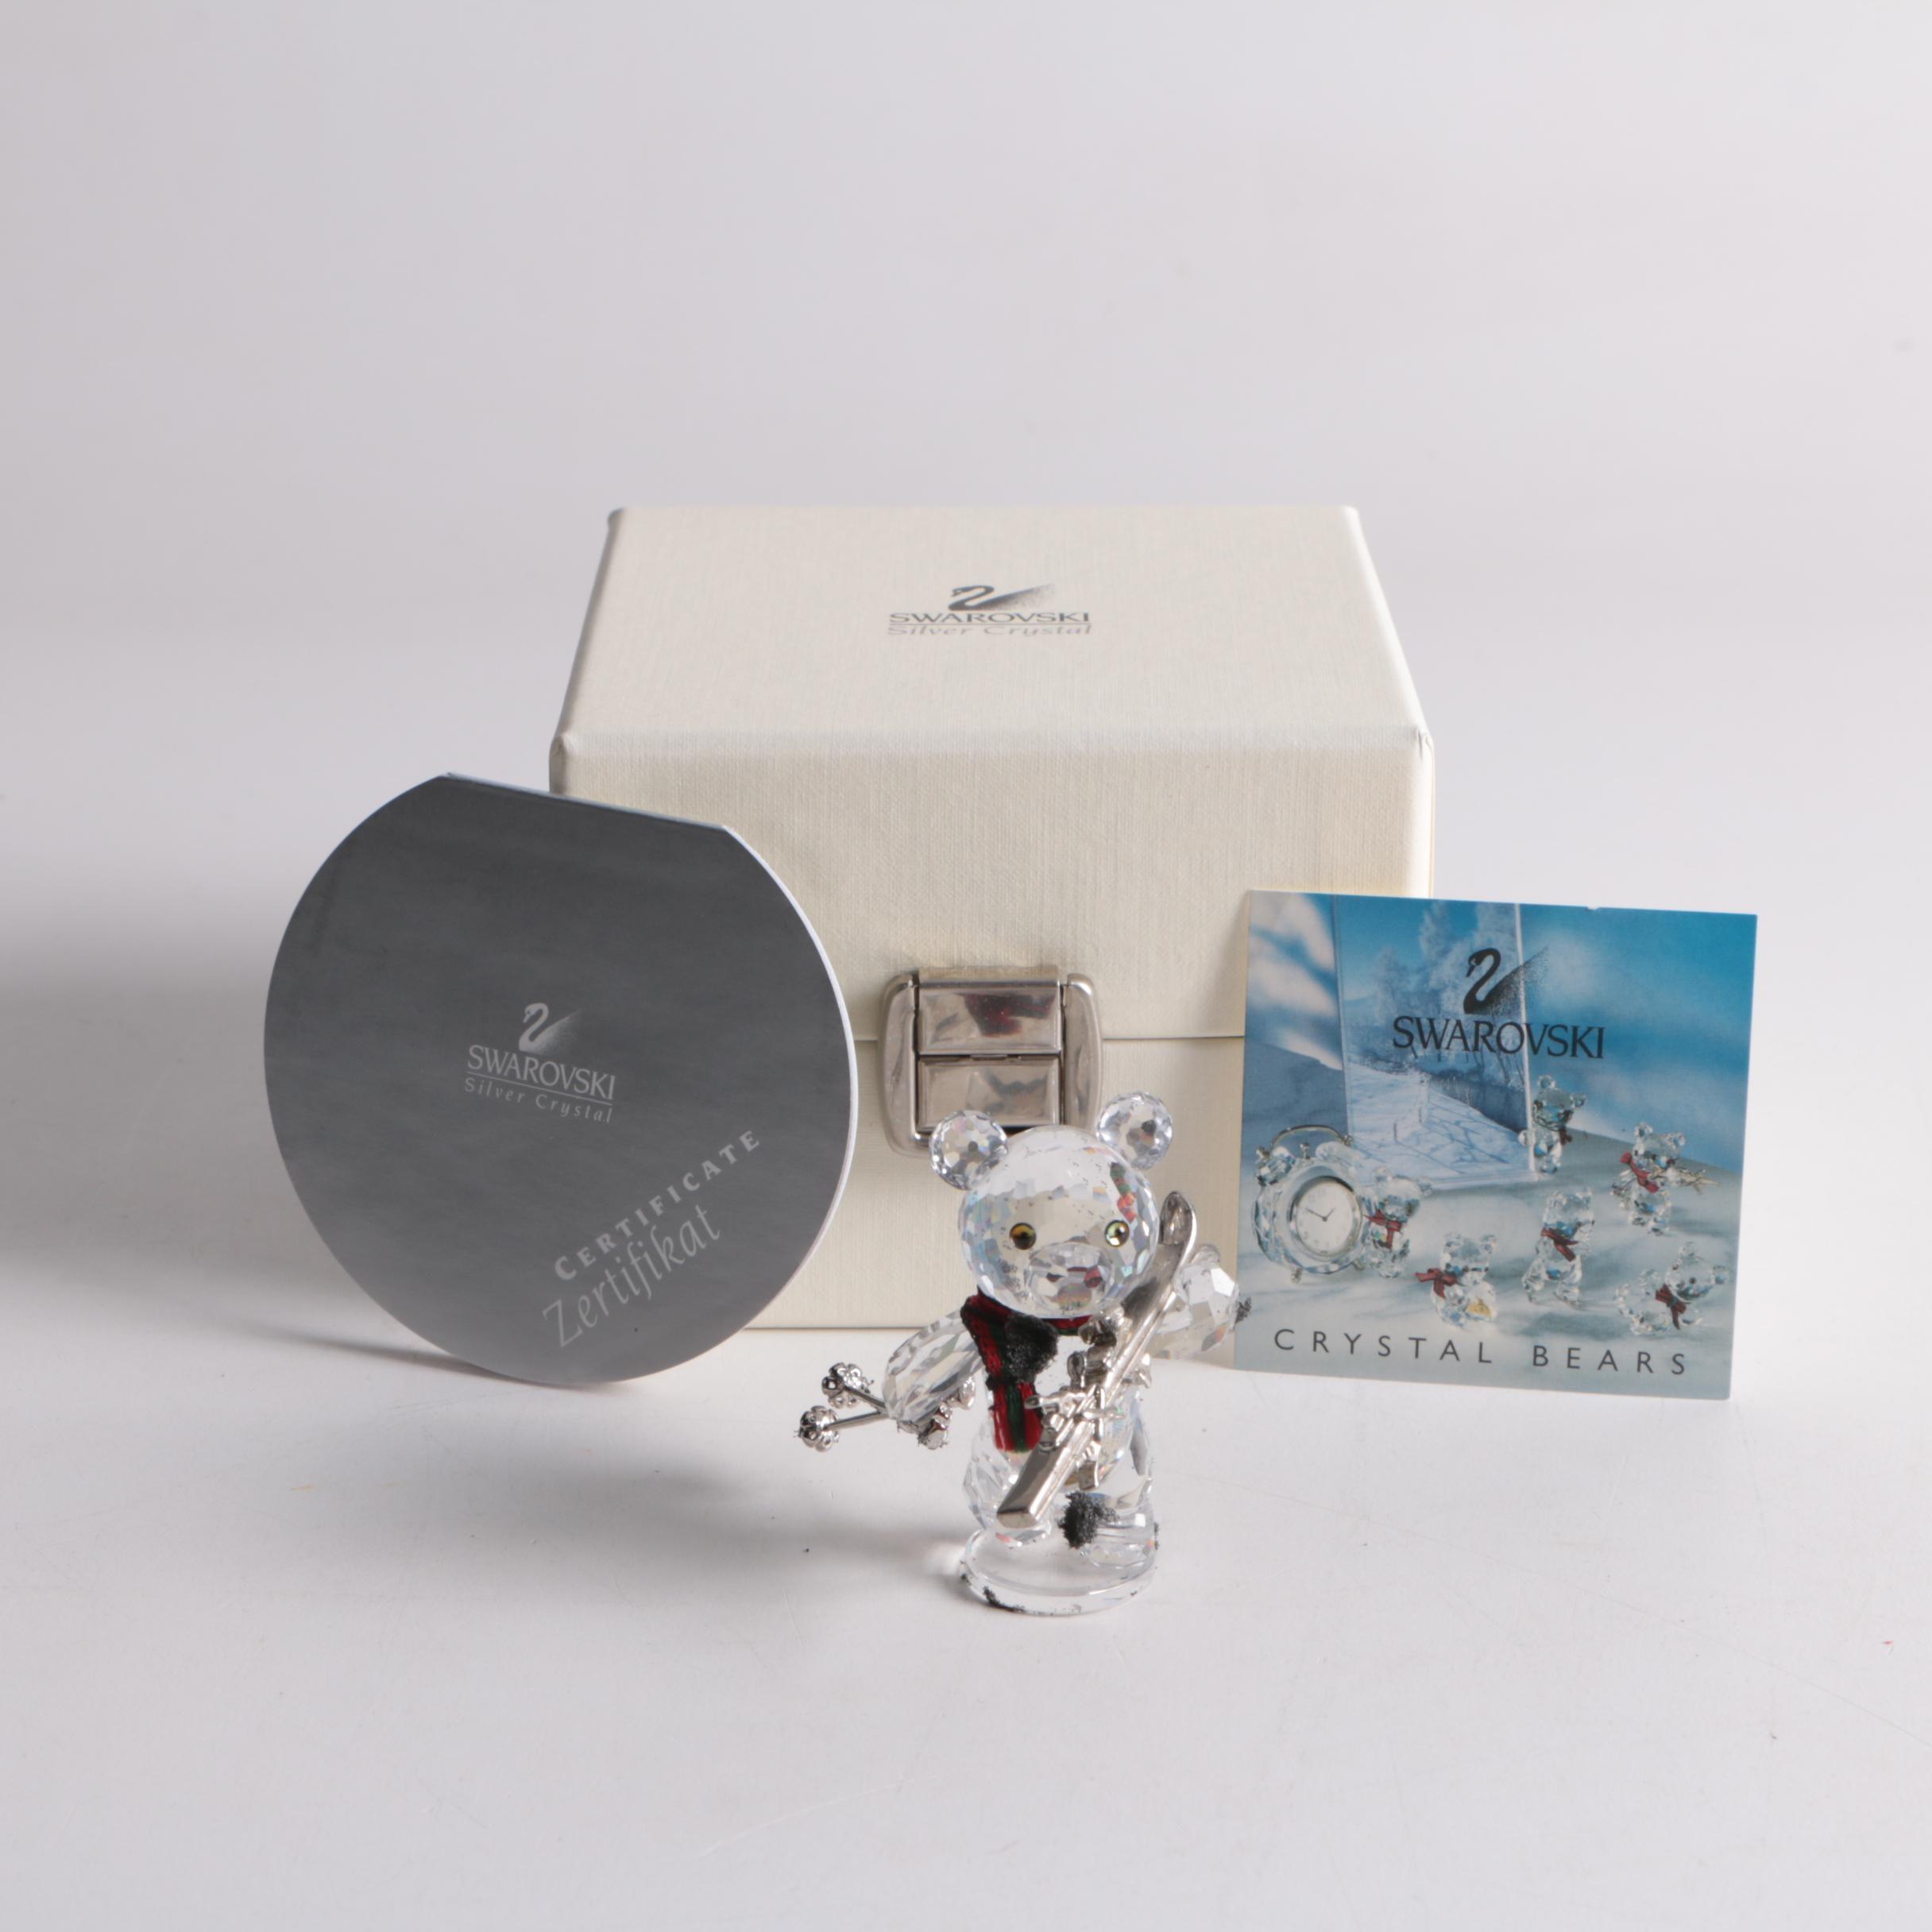 Swarovski Crystal Skiing Bear Figurine